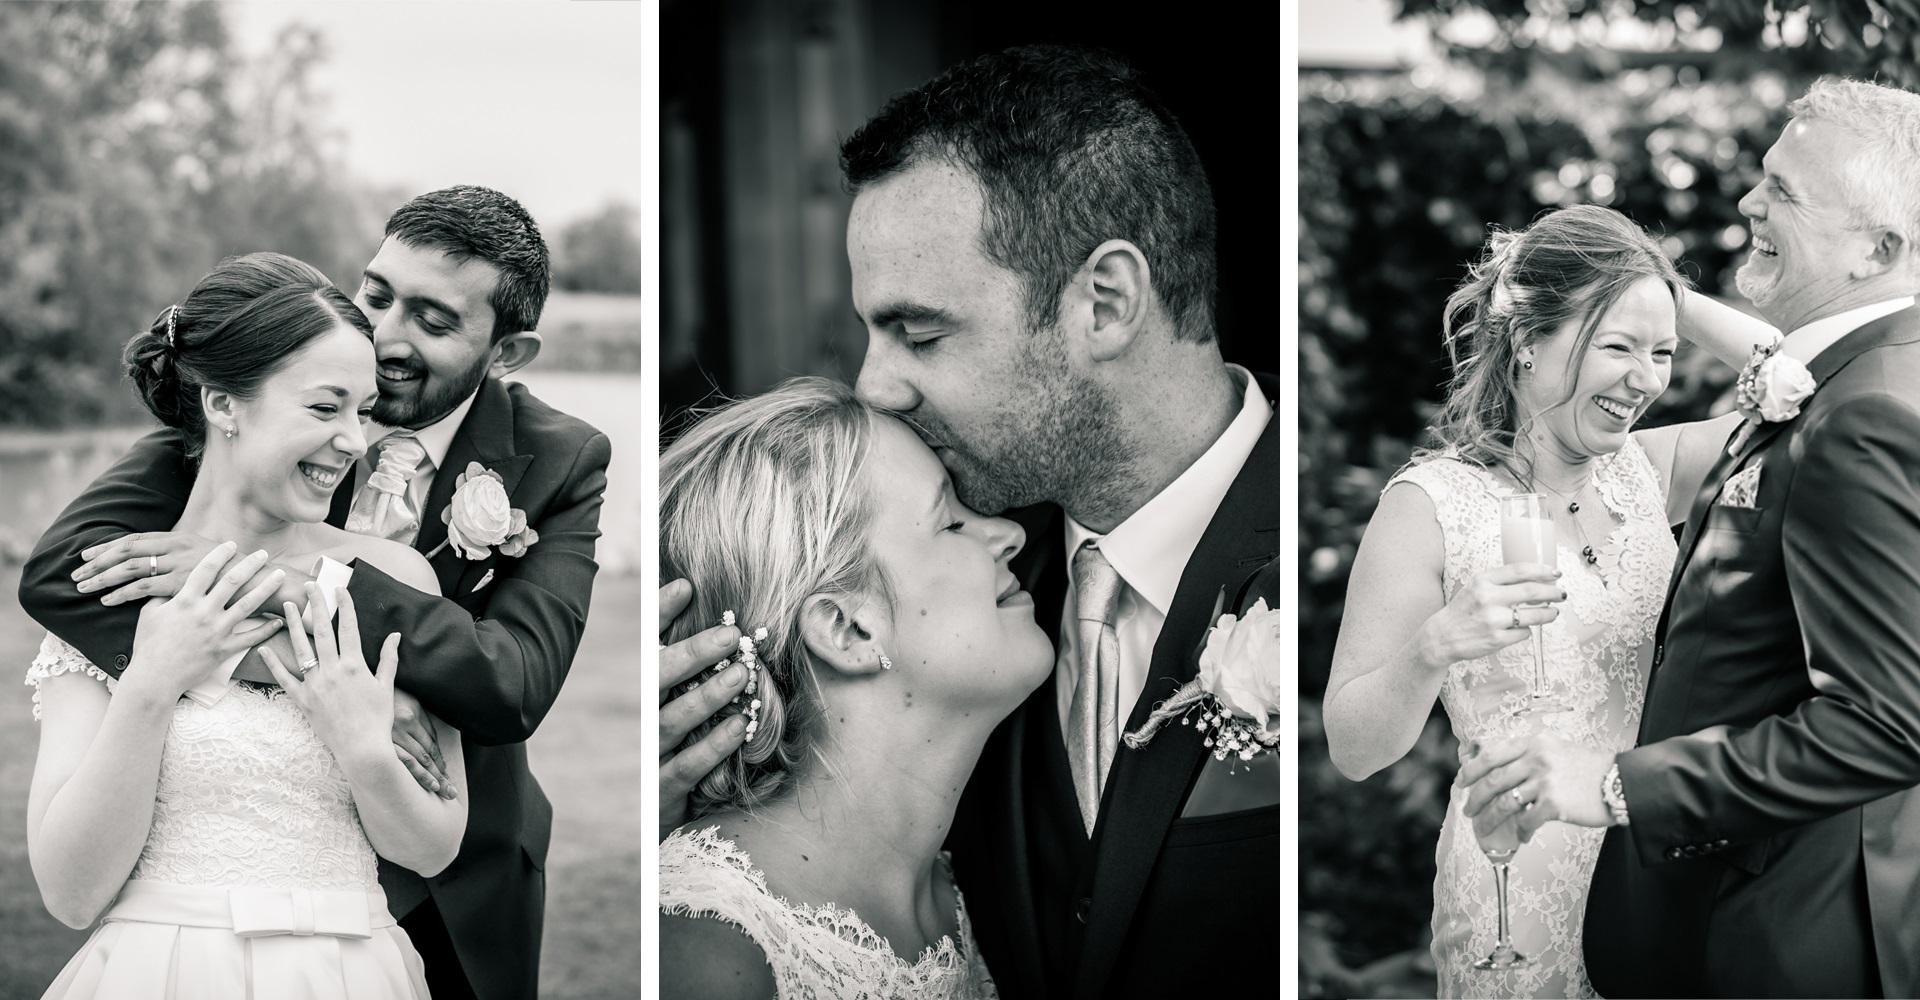 Warwickshire-wedding-photographer-chris-fossey-3